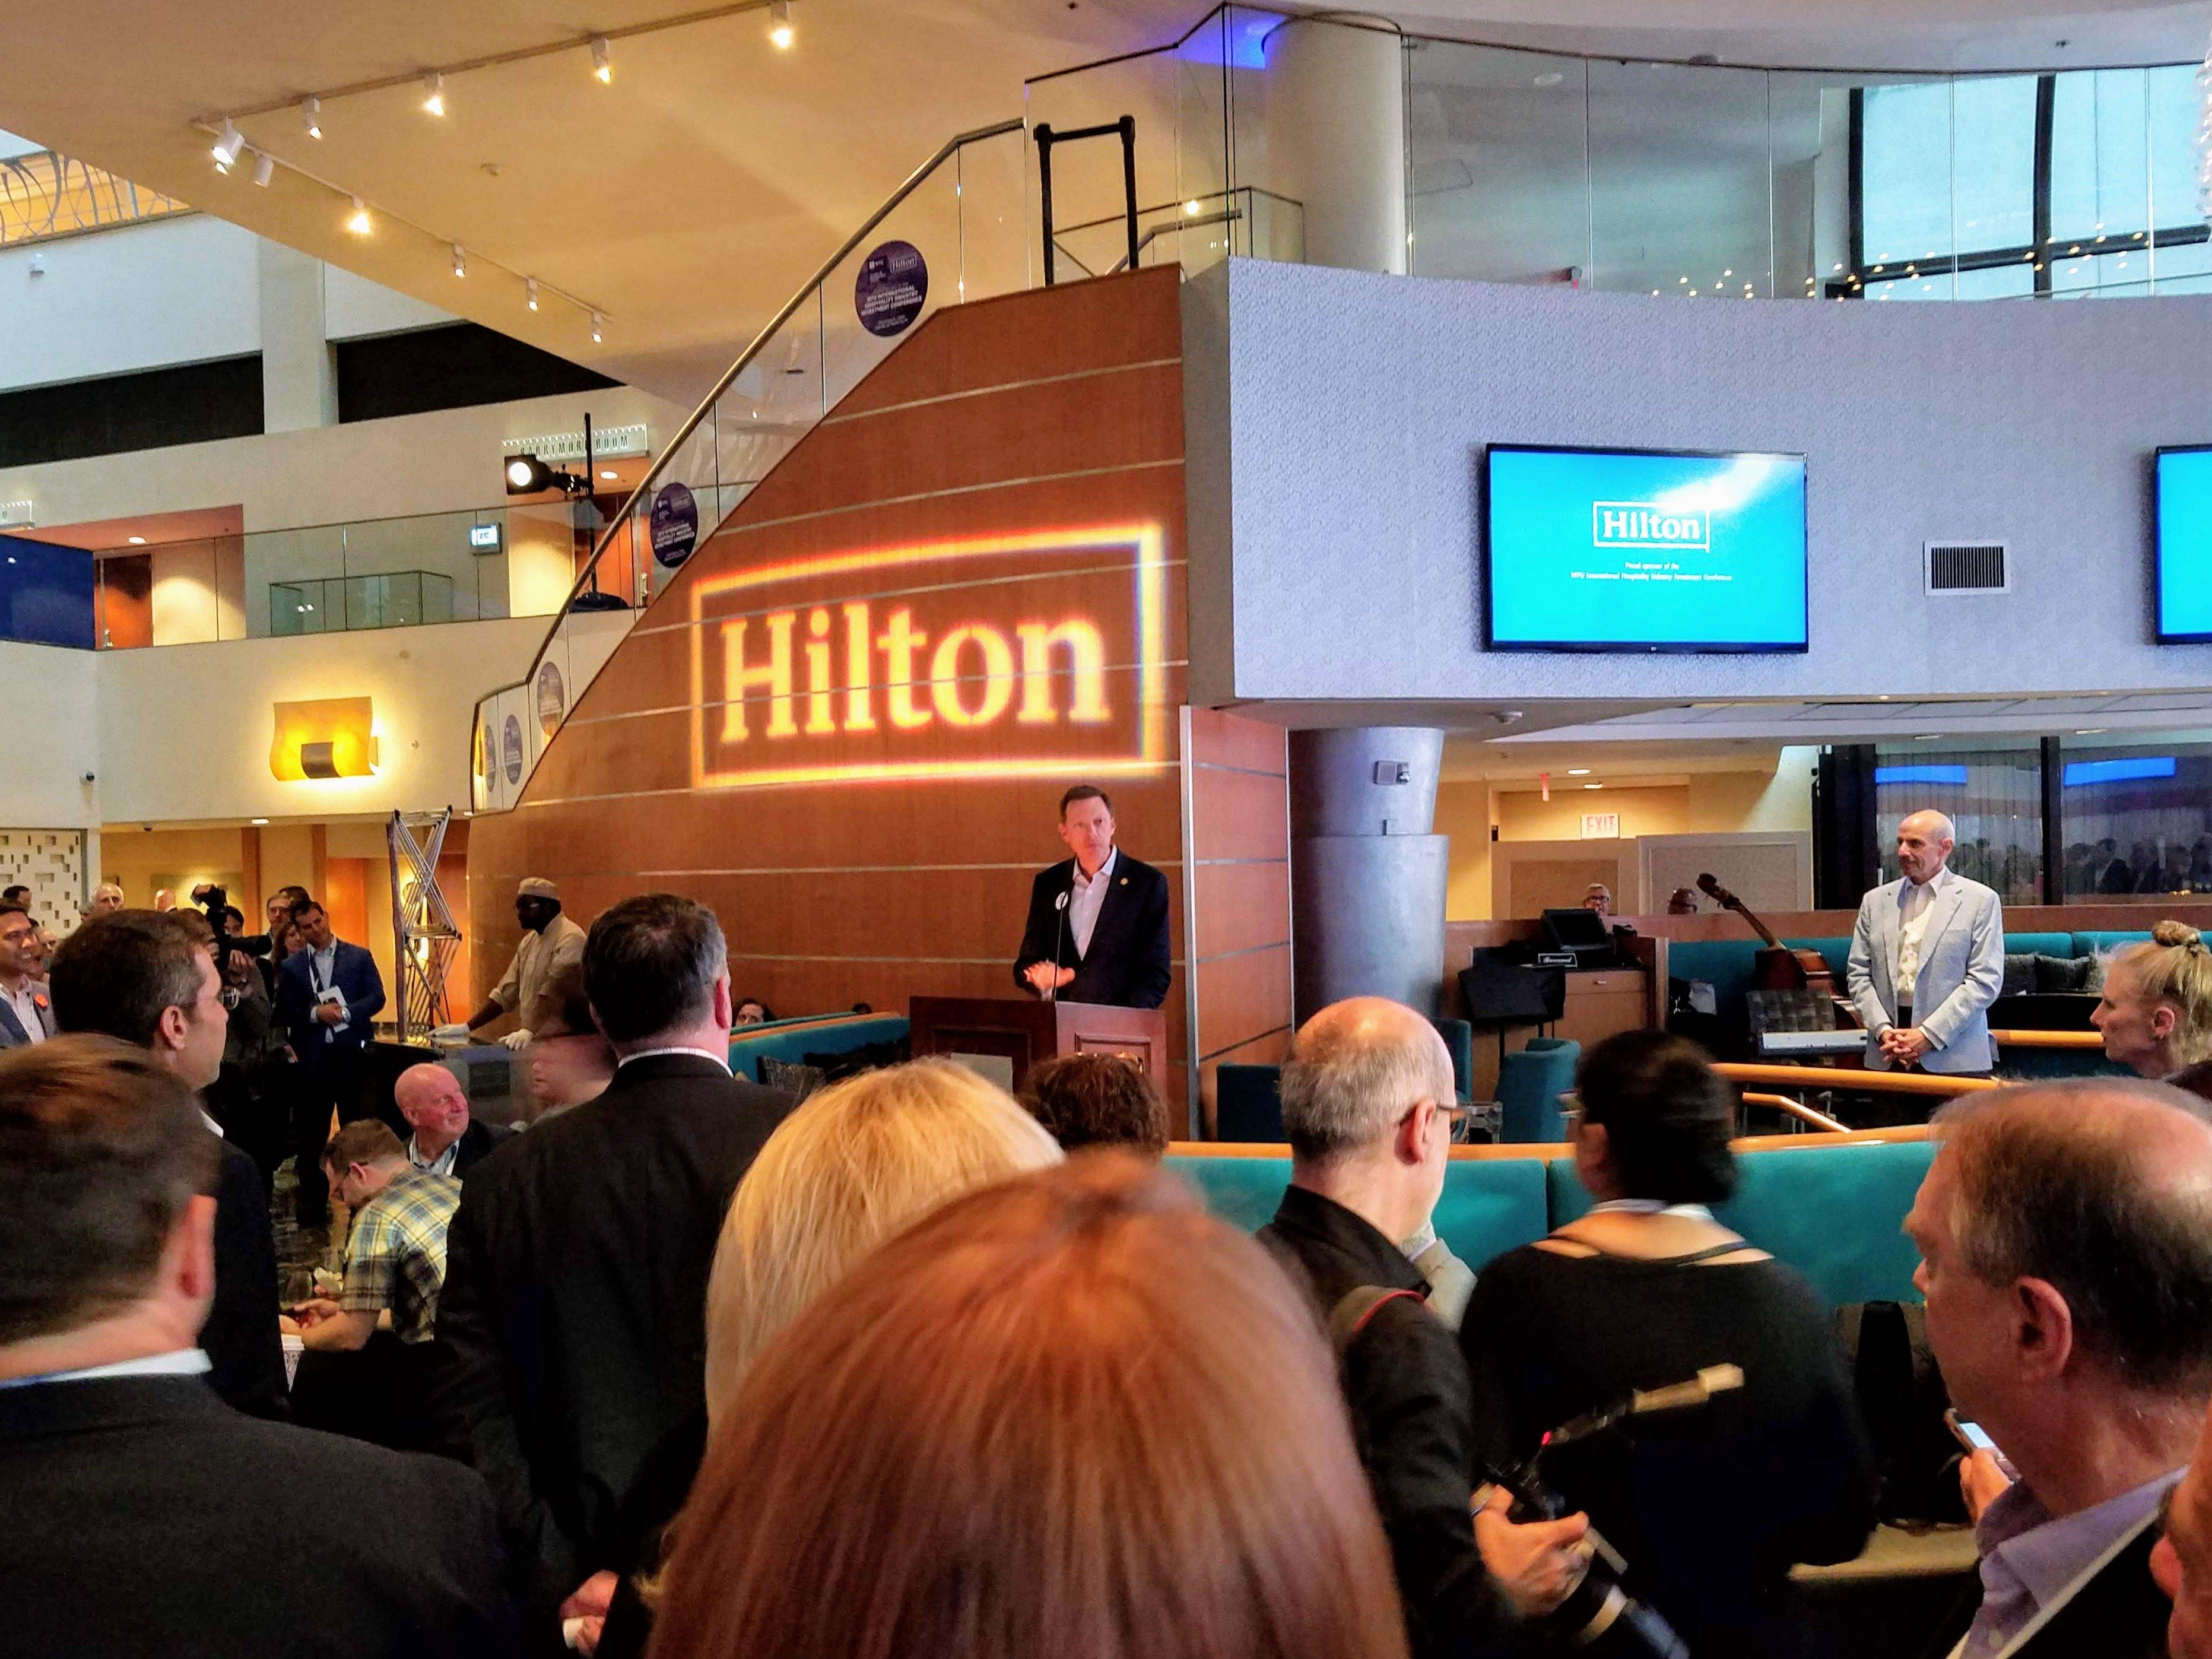 Kevin J. Jacobs, CFO, Hilton, addresses the crowd.